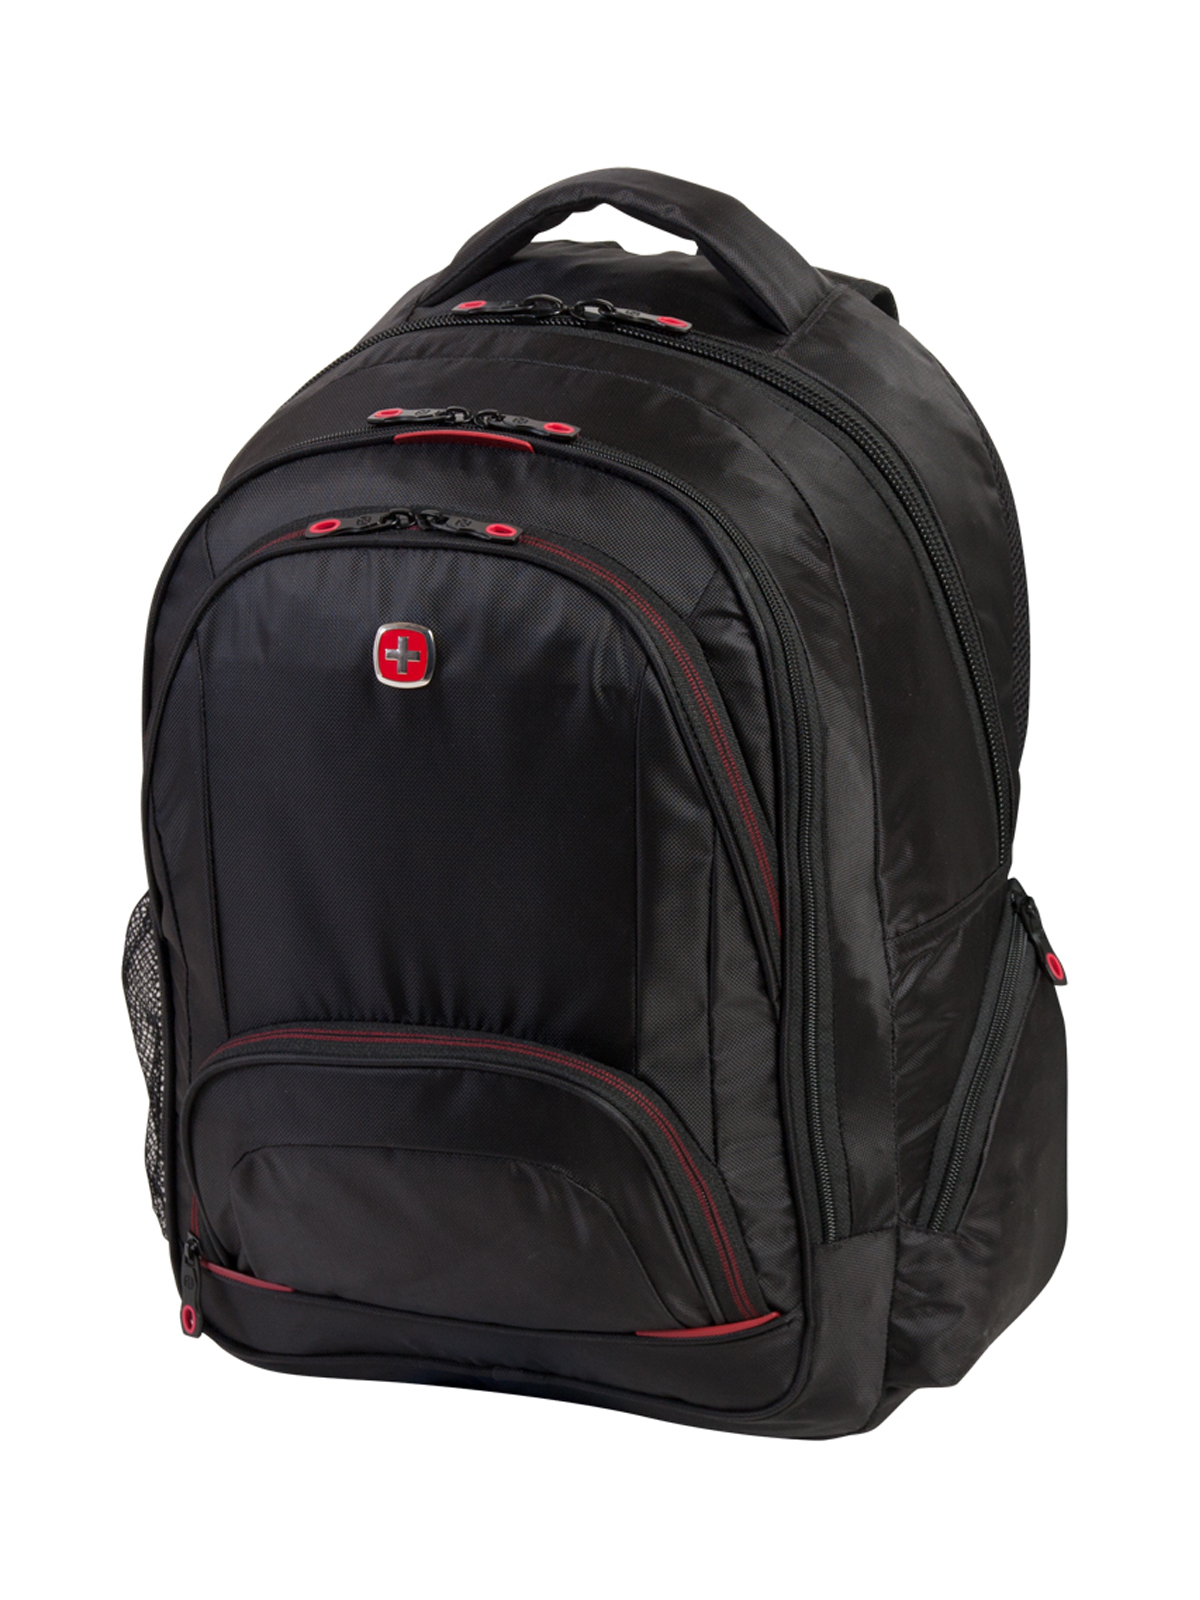 Swiss Gear Computer Backpack